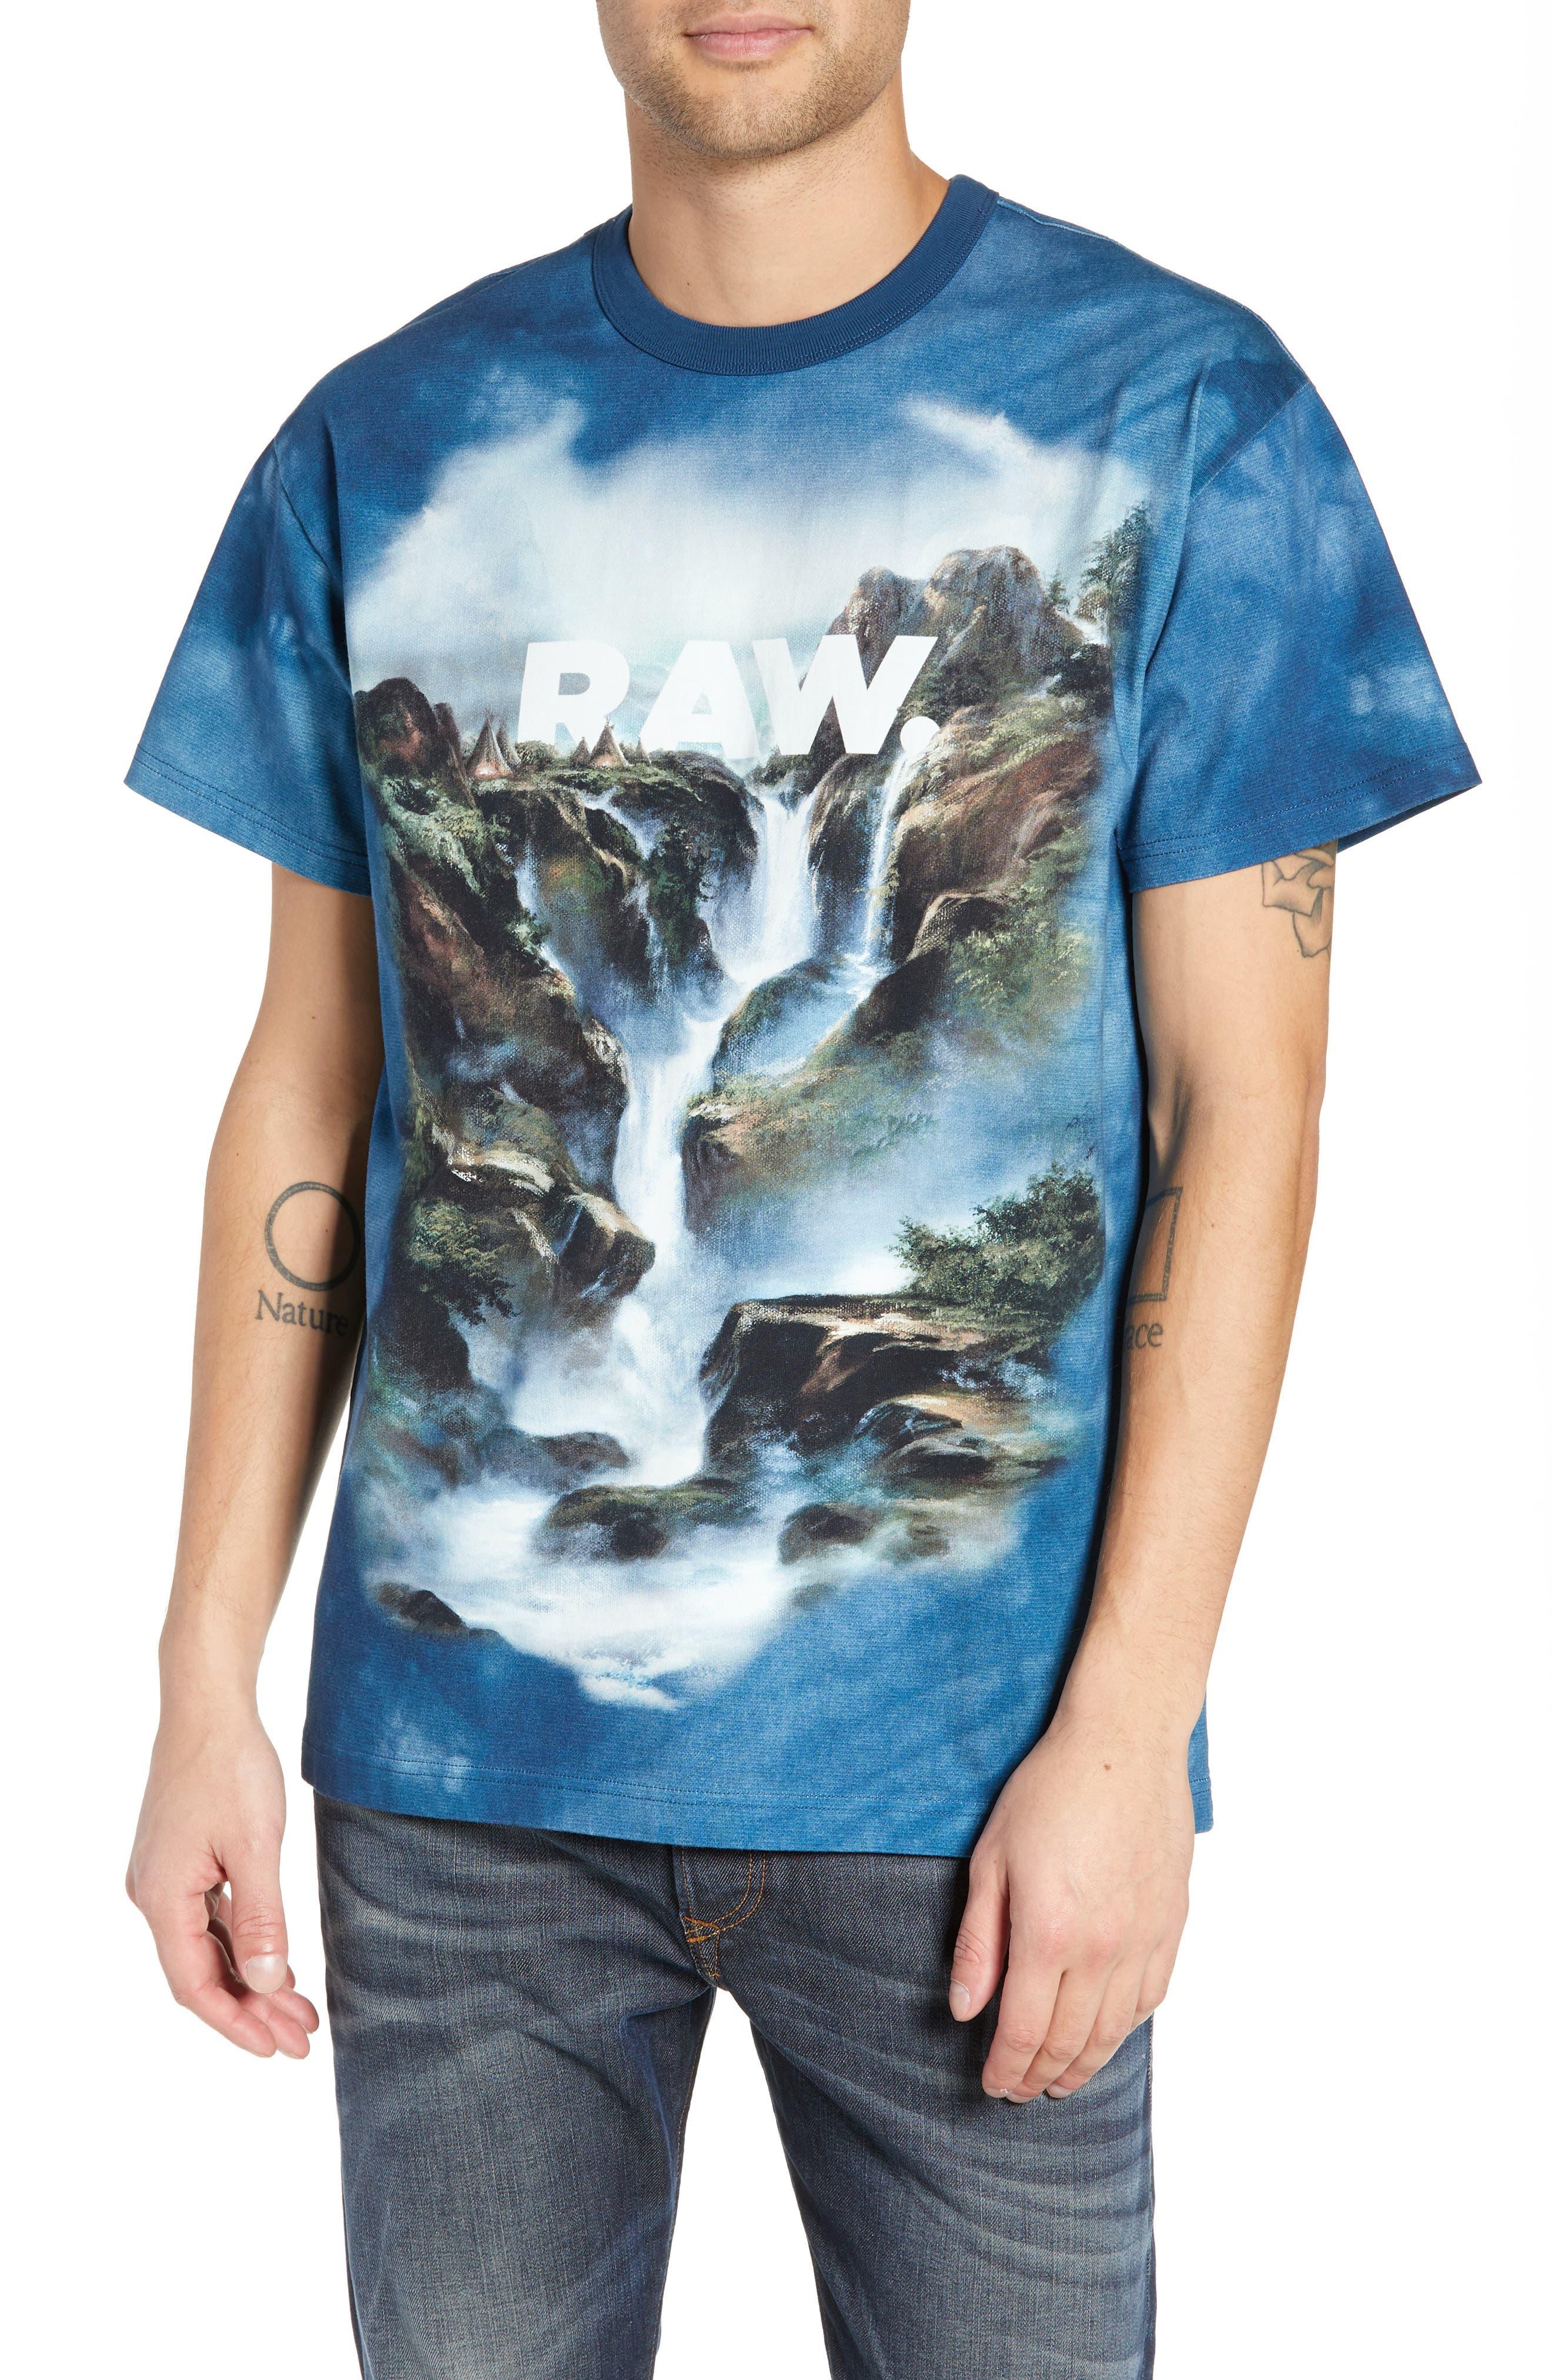 G-Star Cyrer Waterfall Loose T-Shirt,                             Main thumbnail 1, color,                             TEAL BLUE